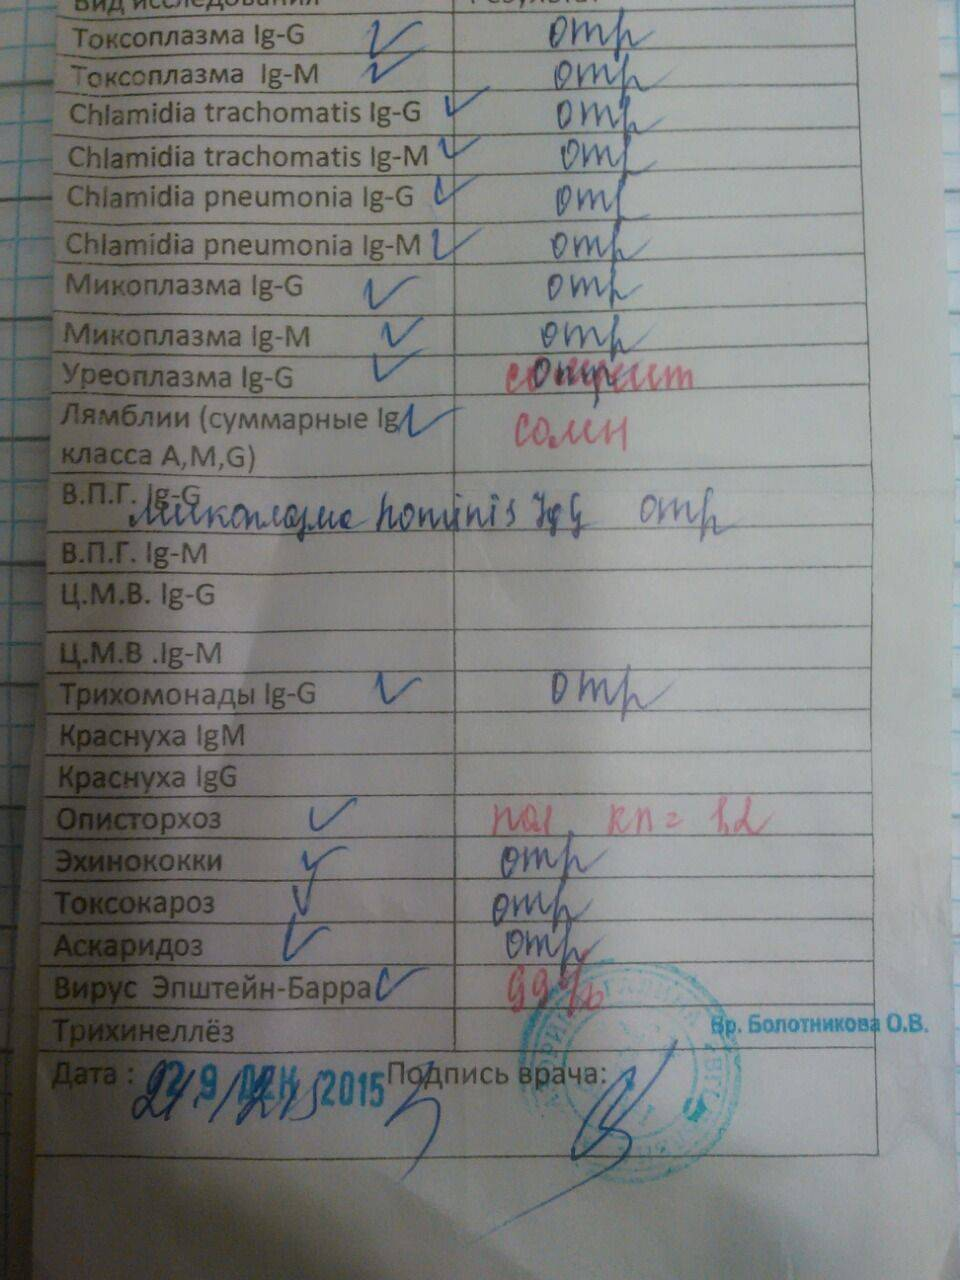 анализ крови на описторхоз расшифровка